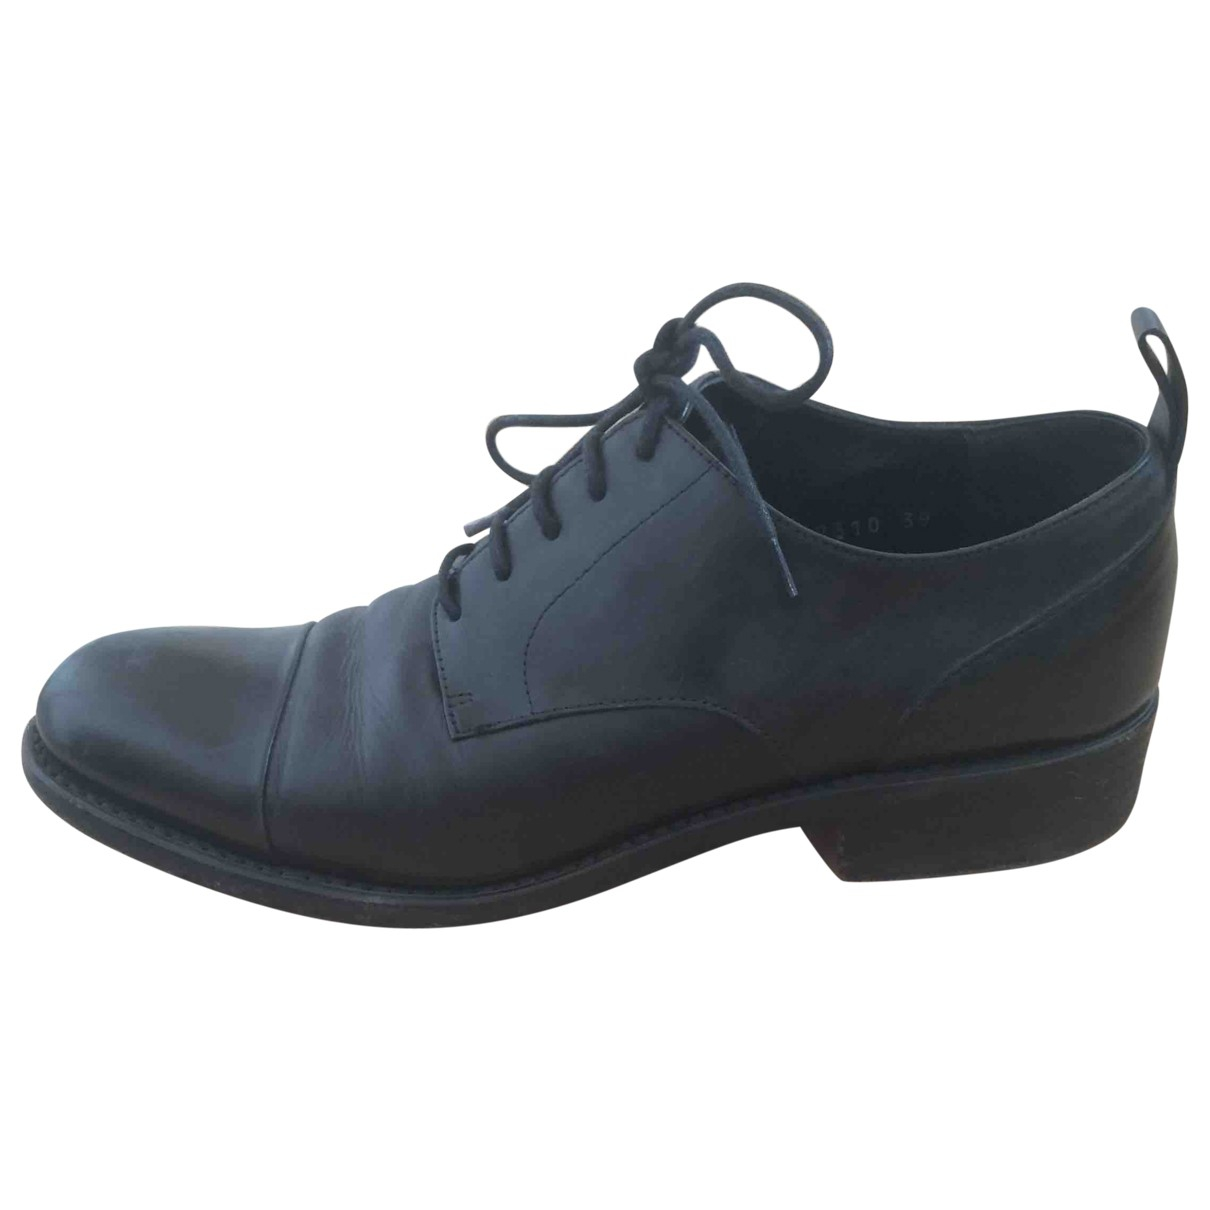 Dries Van Noten Leather lace ups